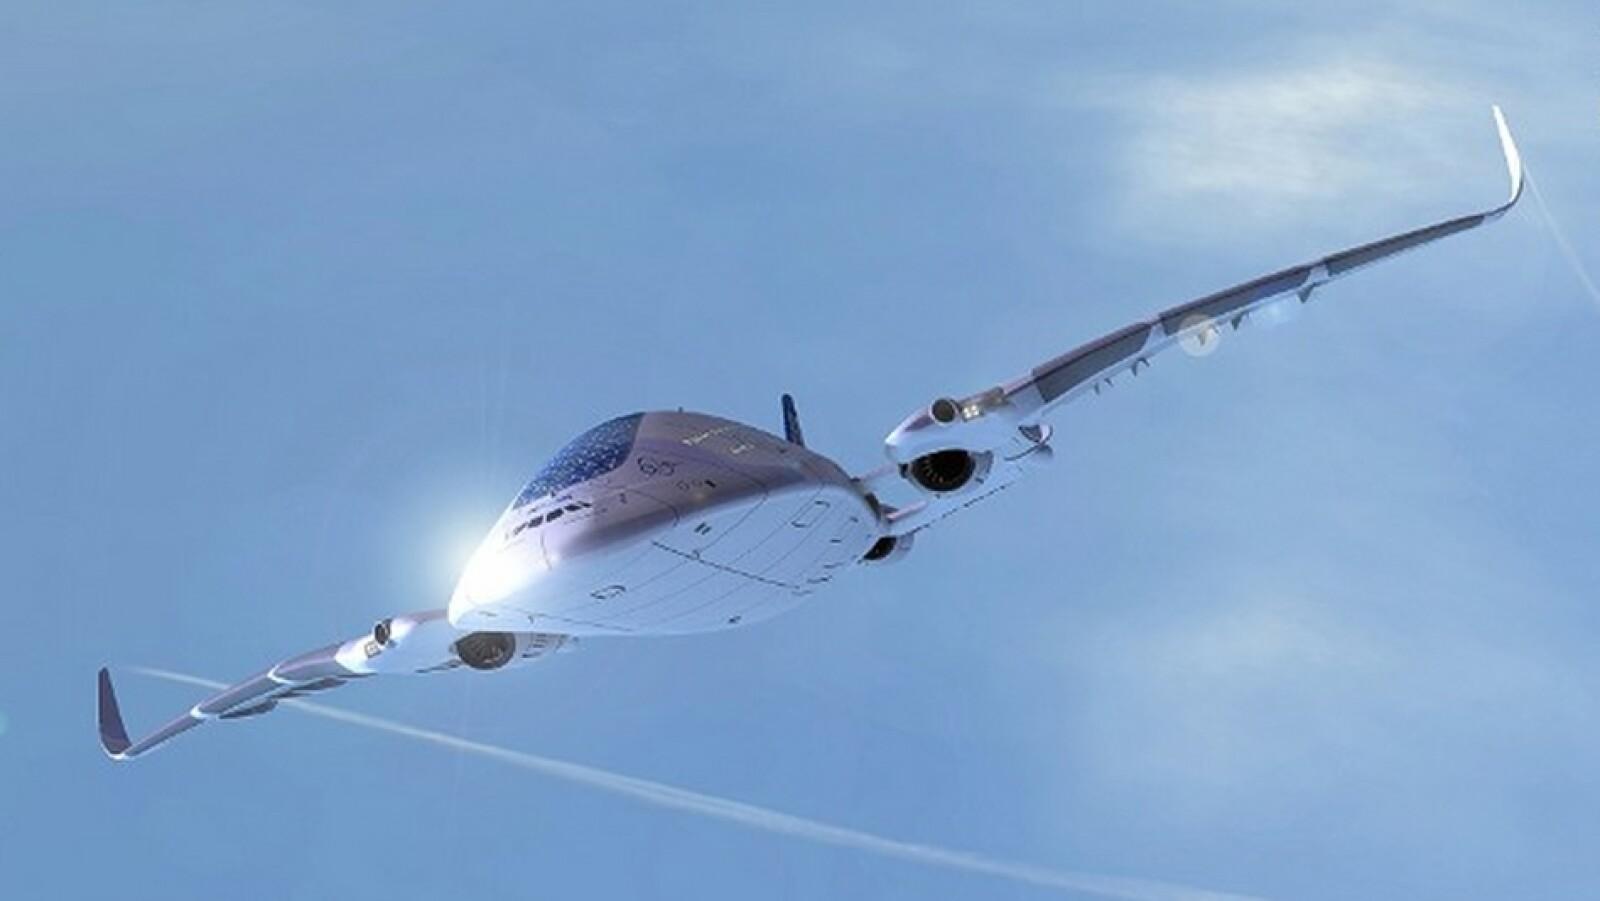 avion ecologico conocido como avion ballena